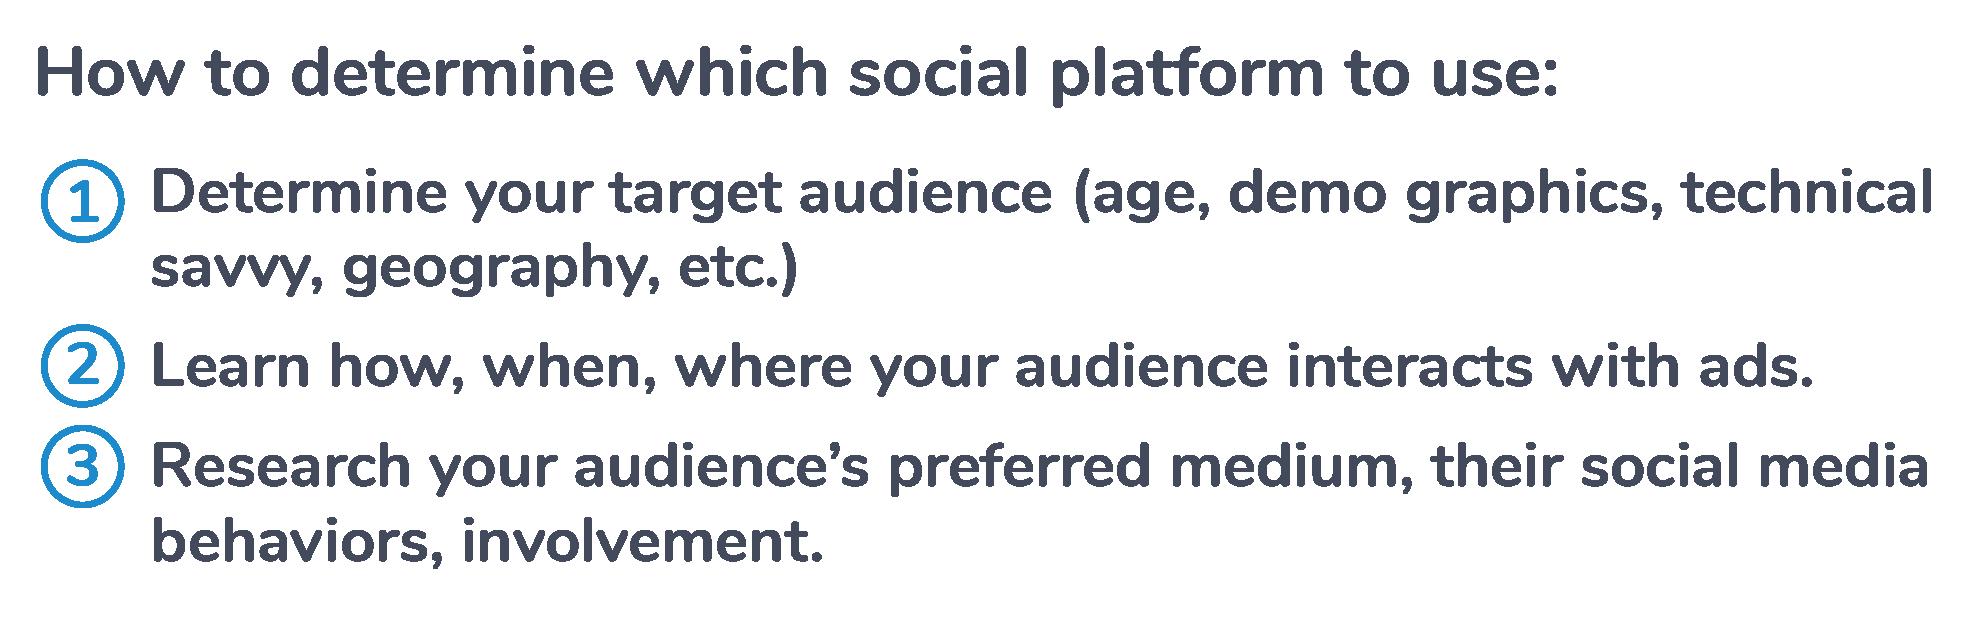 best social platform for content marketing